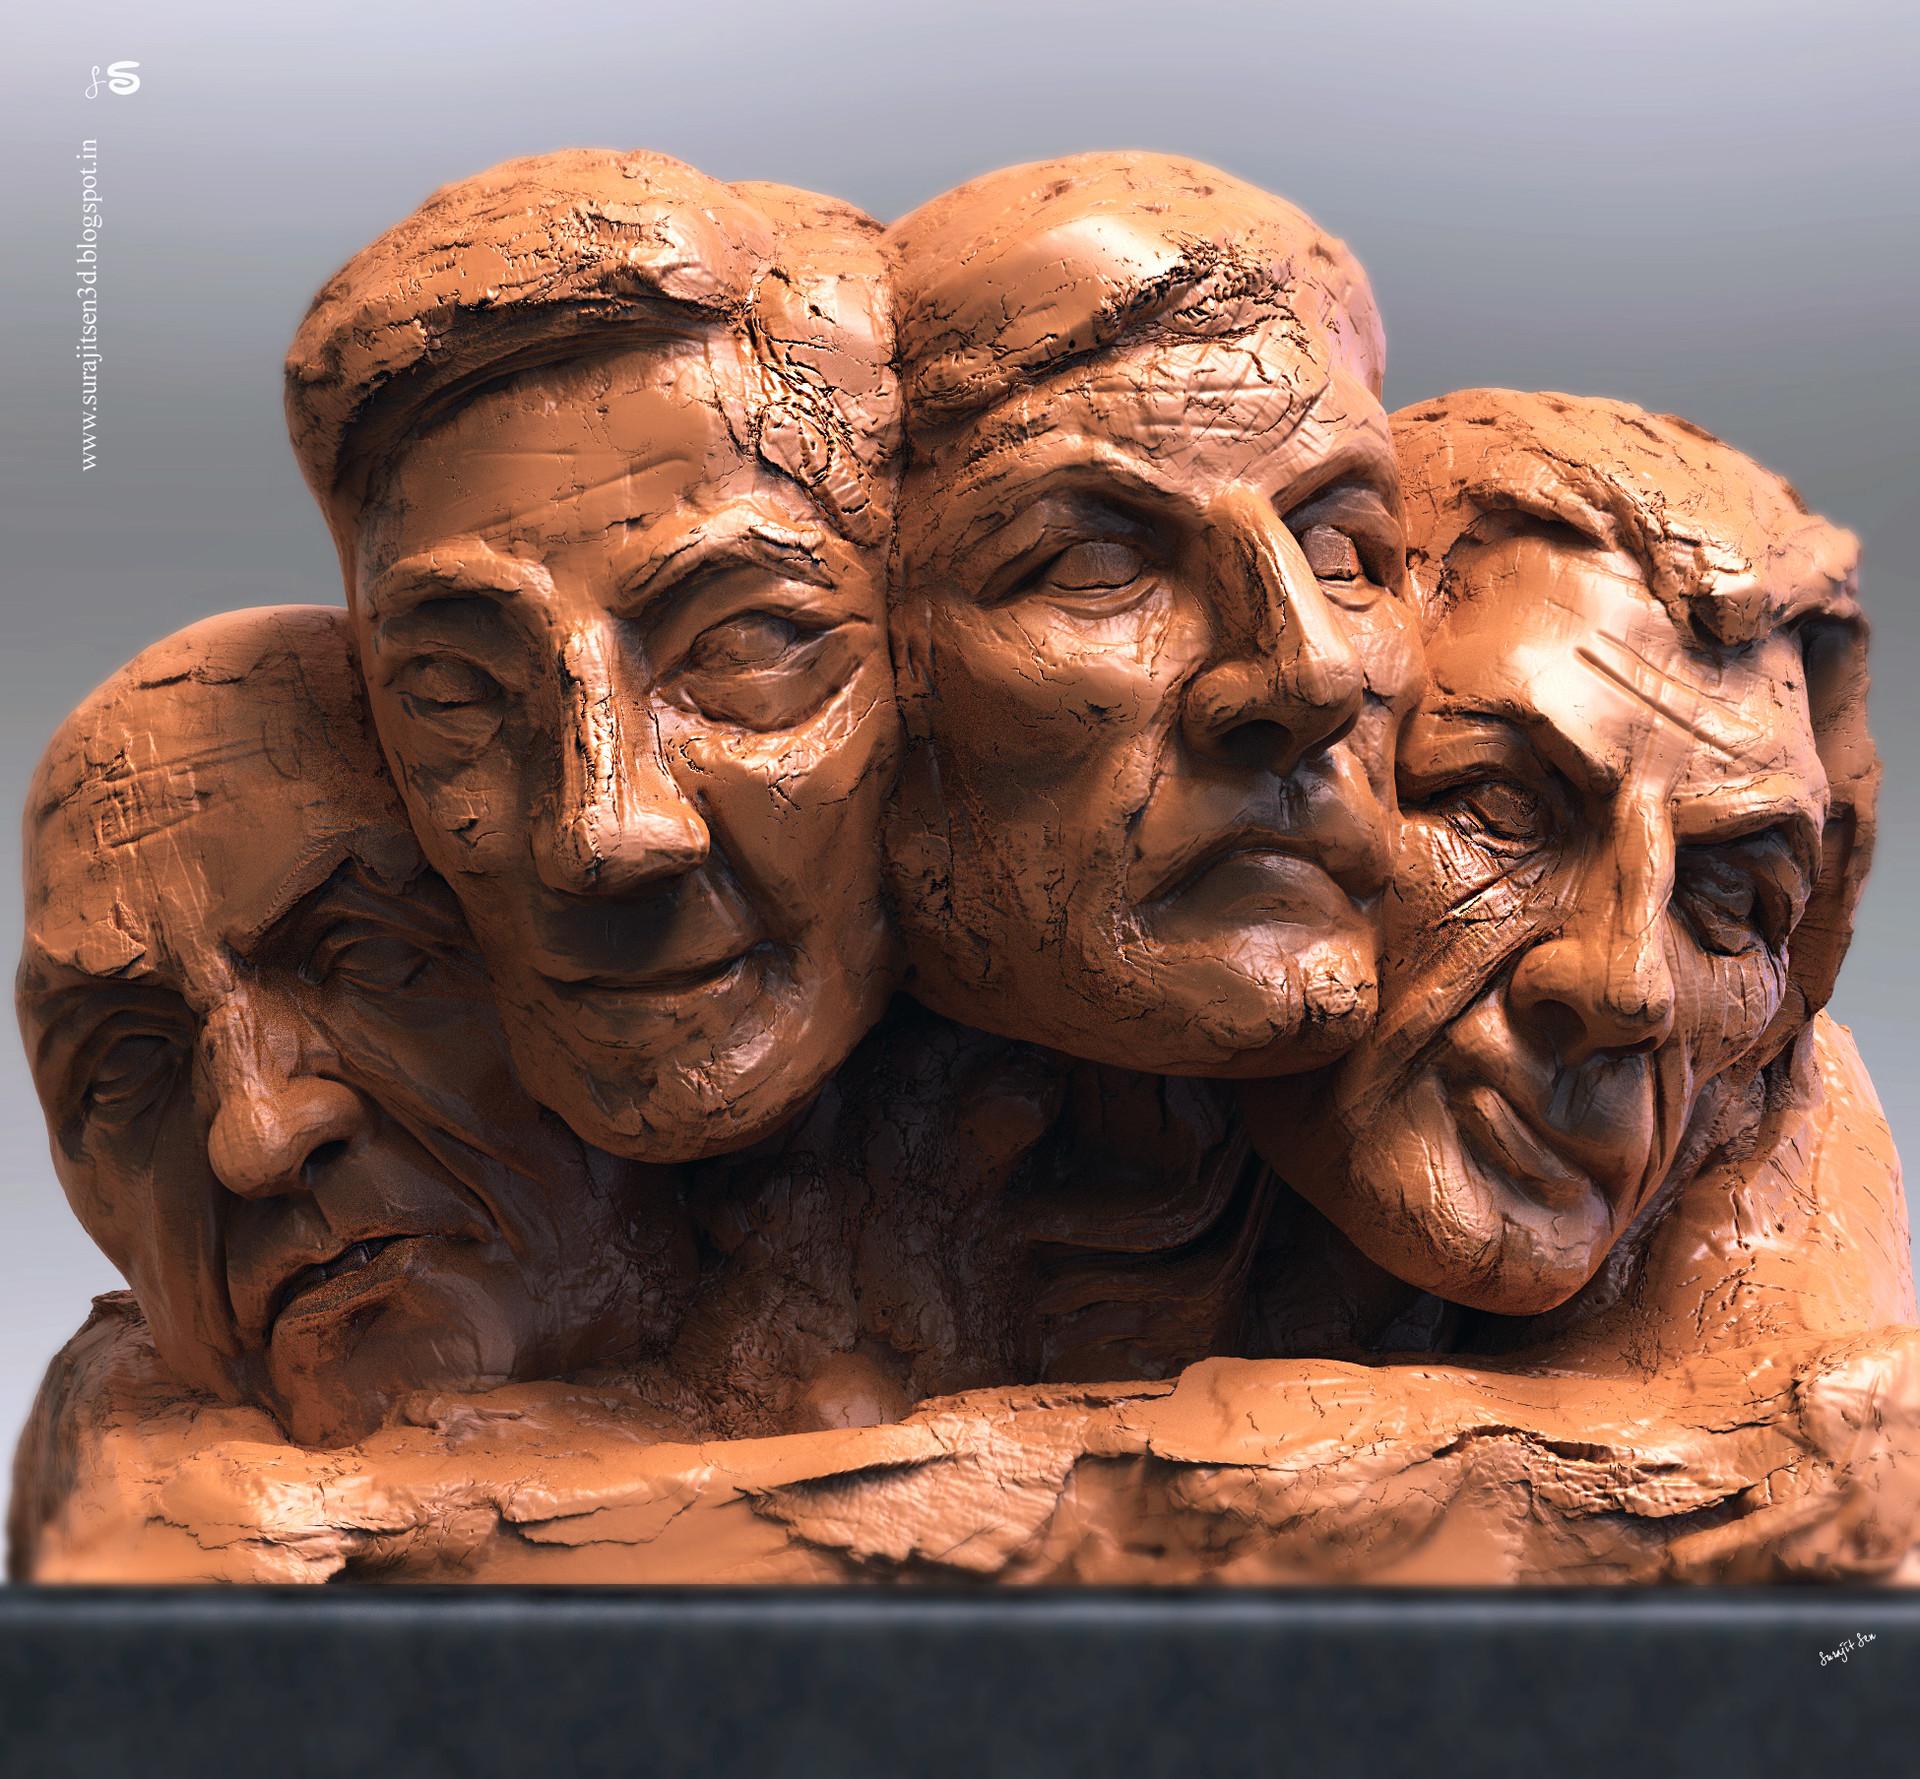 Surajit sen gathered speed digital sculpt study surajitsen jan2019